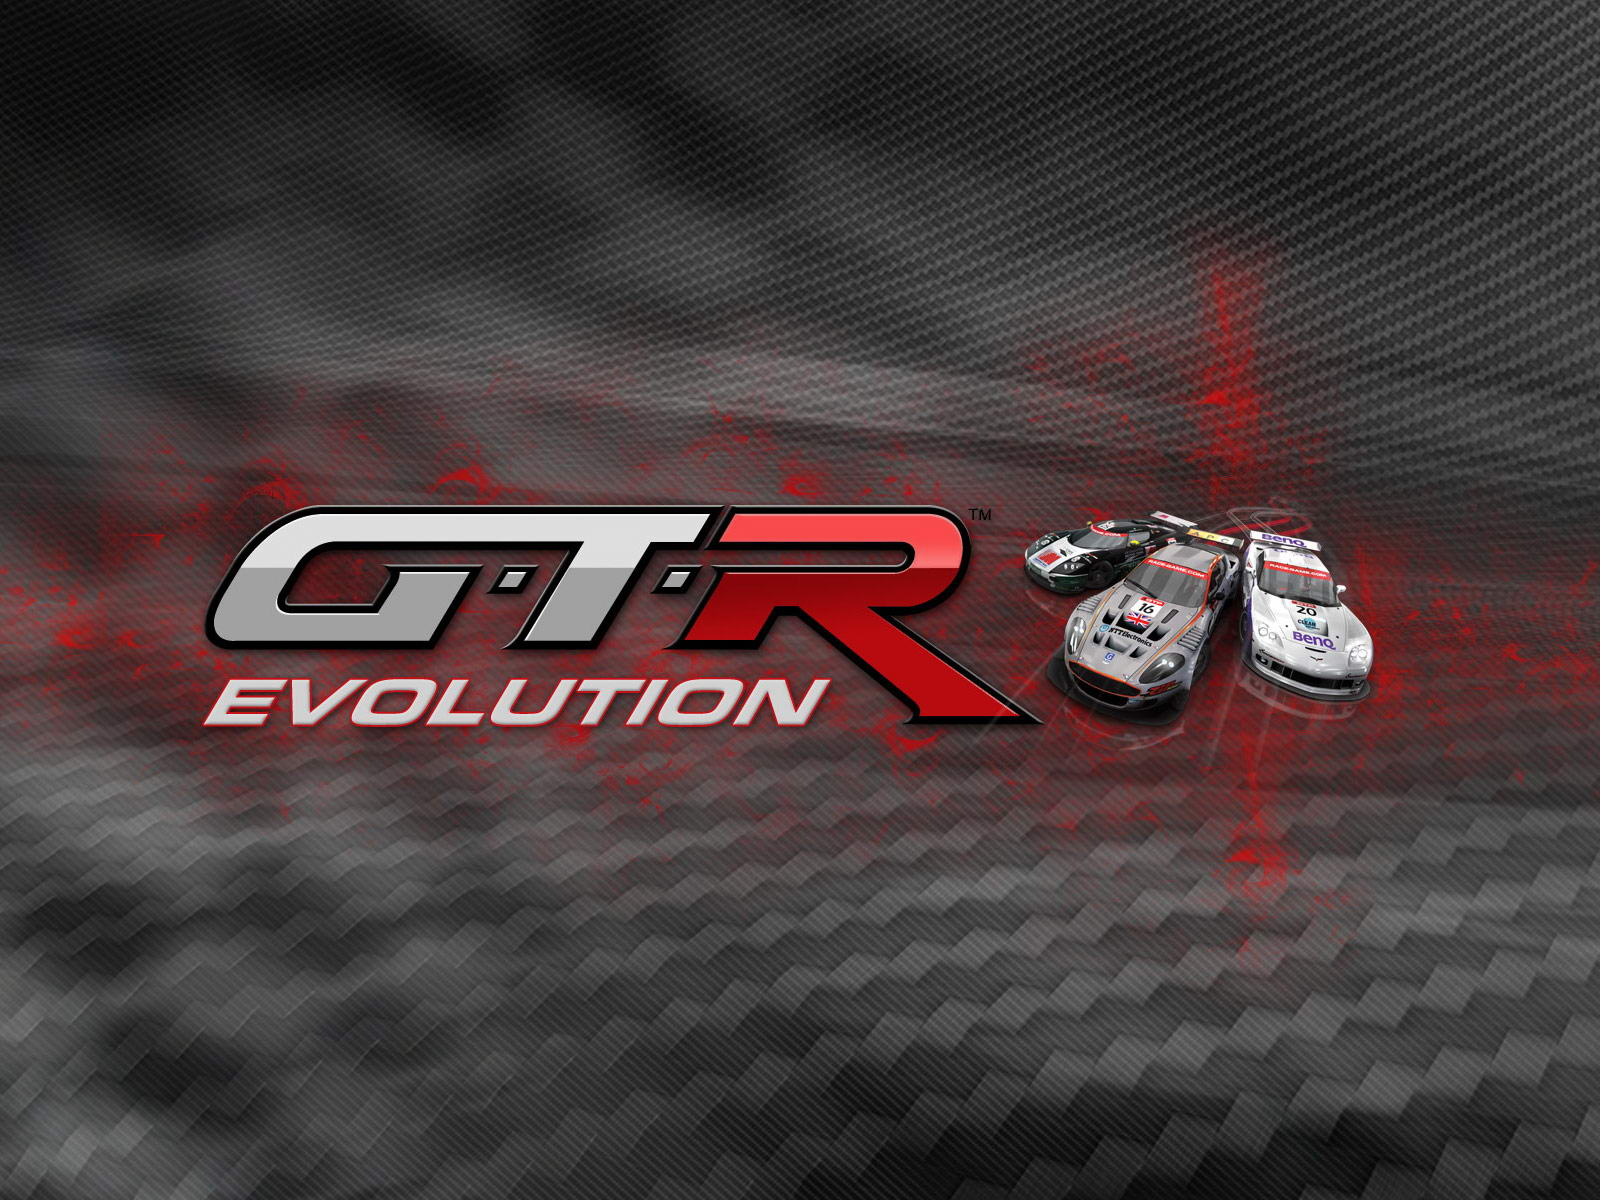 6972d1312191906 logo gtr evolution wallpaper logo wallpaper logojpg 1600x1200